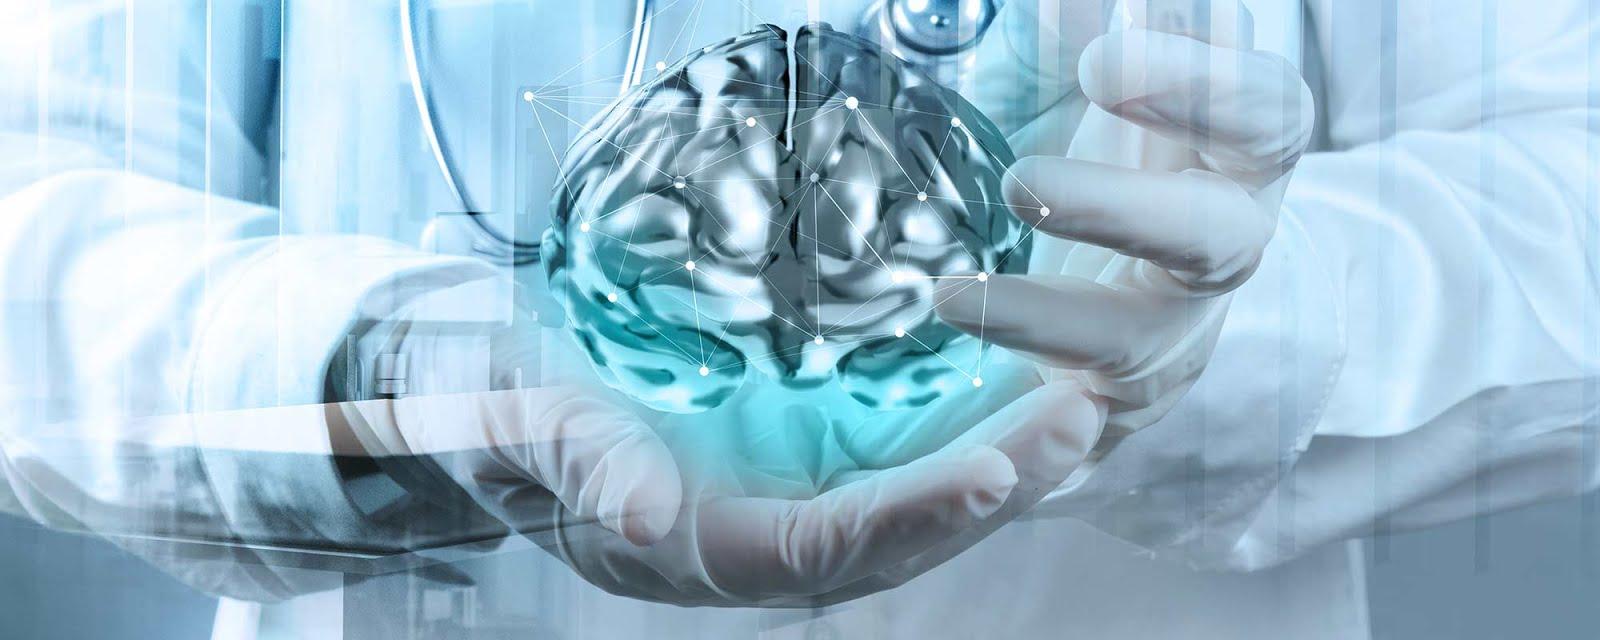 Neurocirugía consulta externa Fundación hospital san carlos